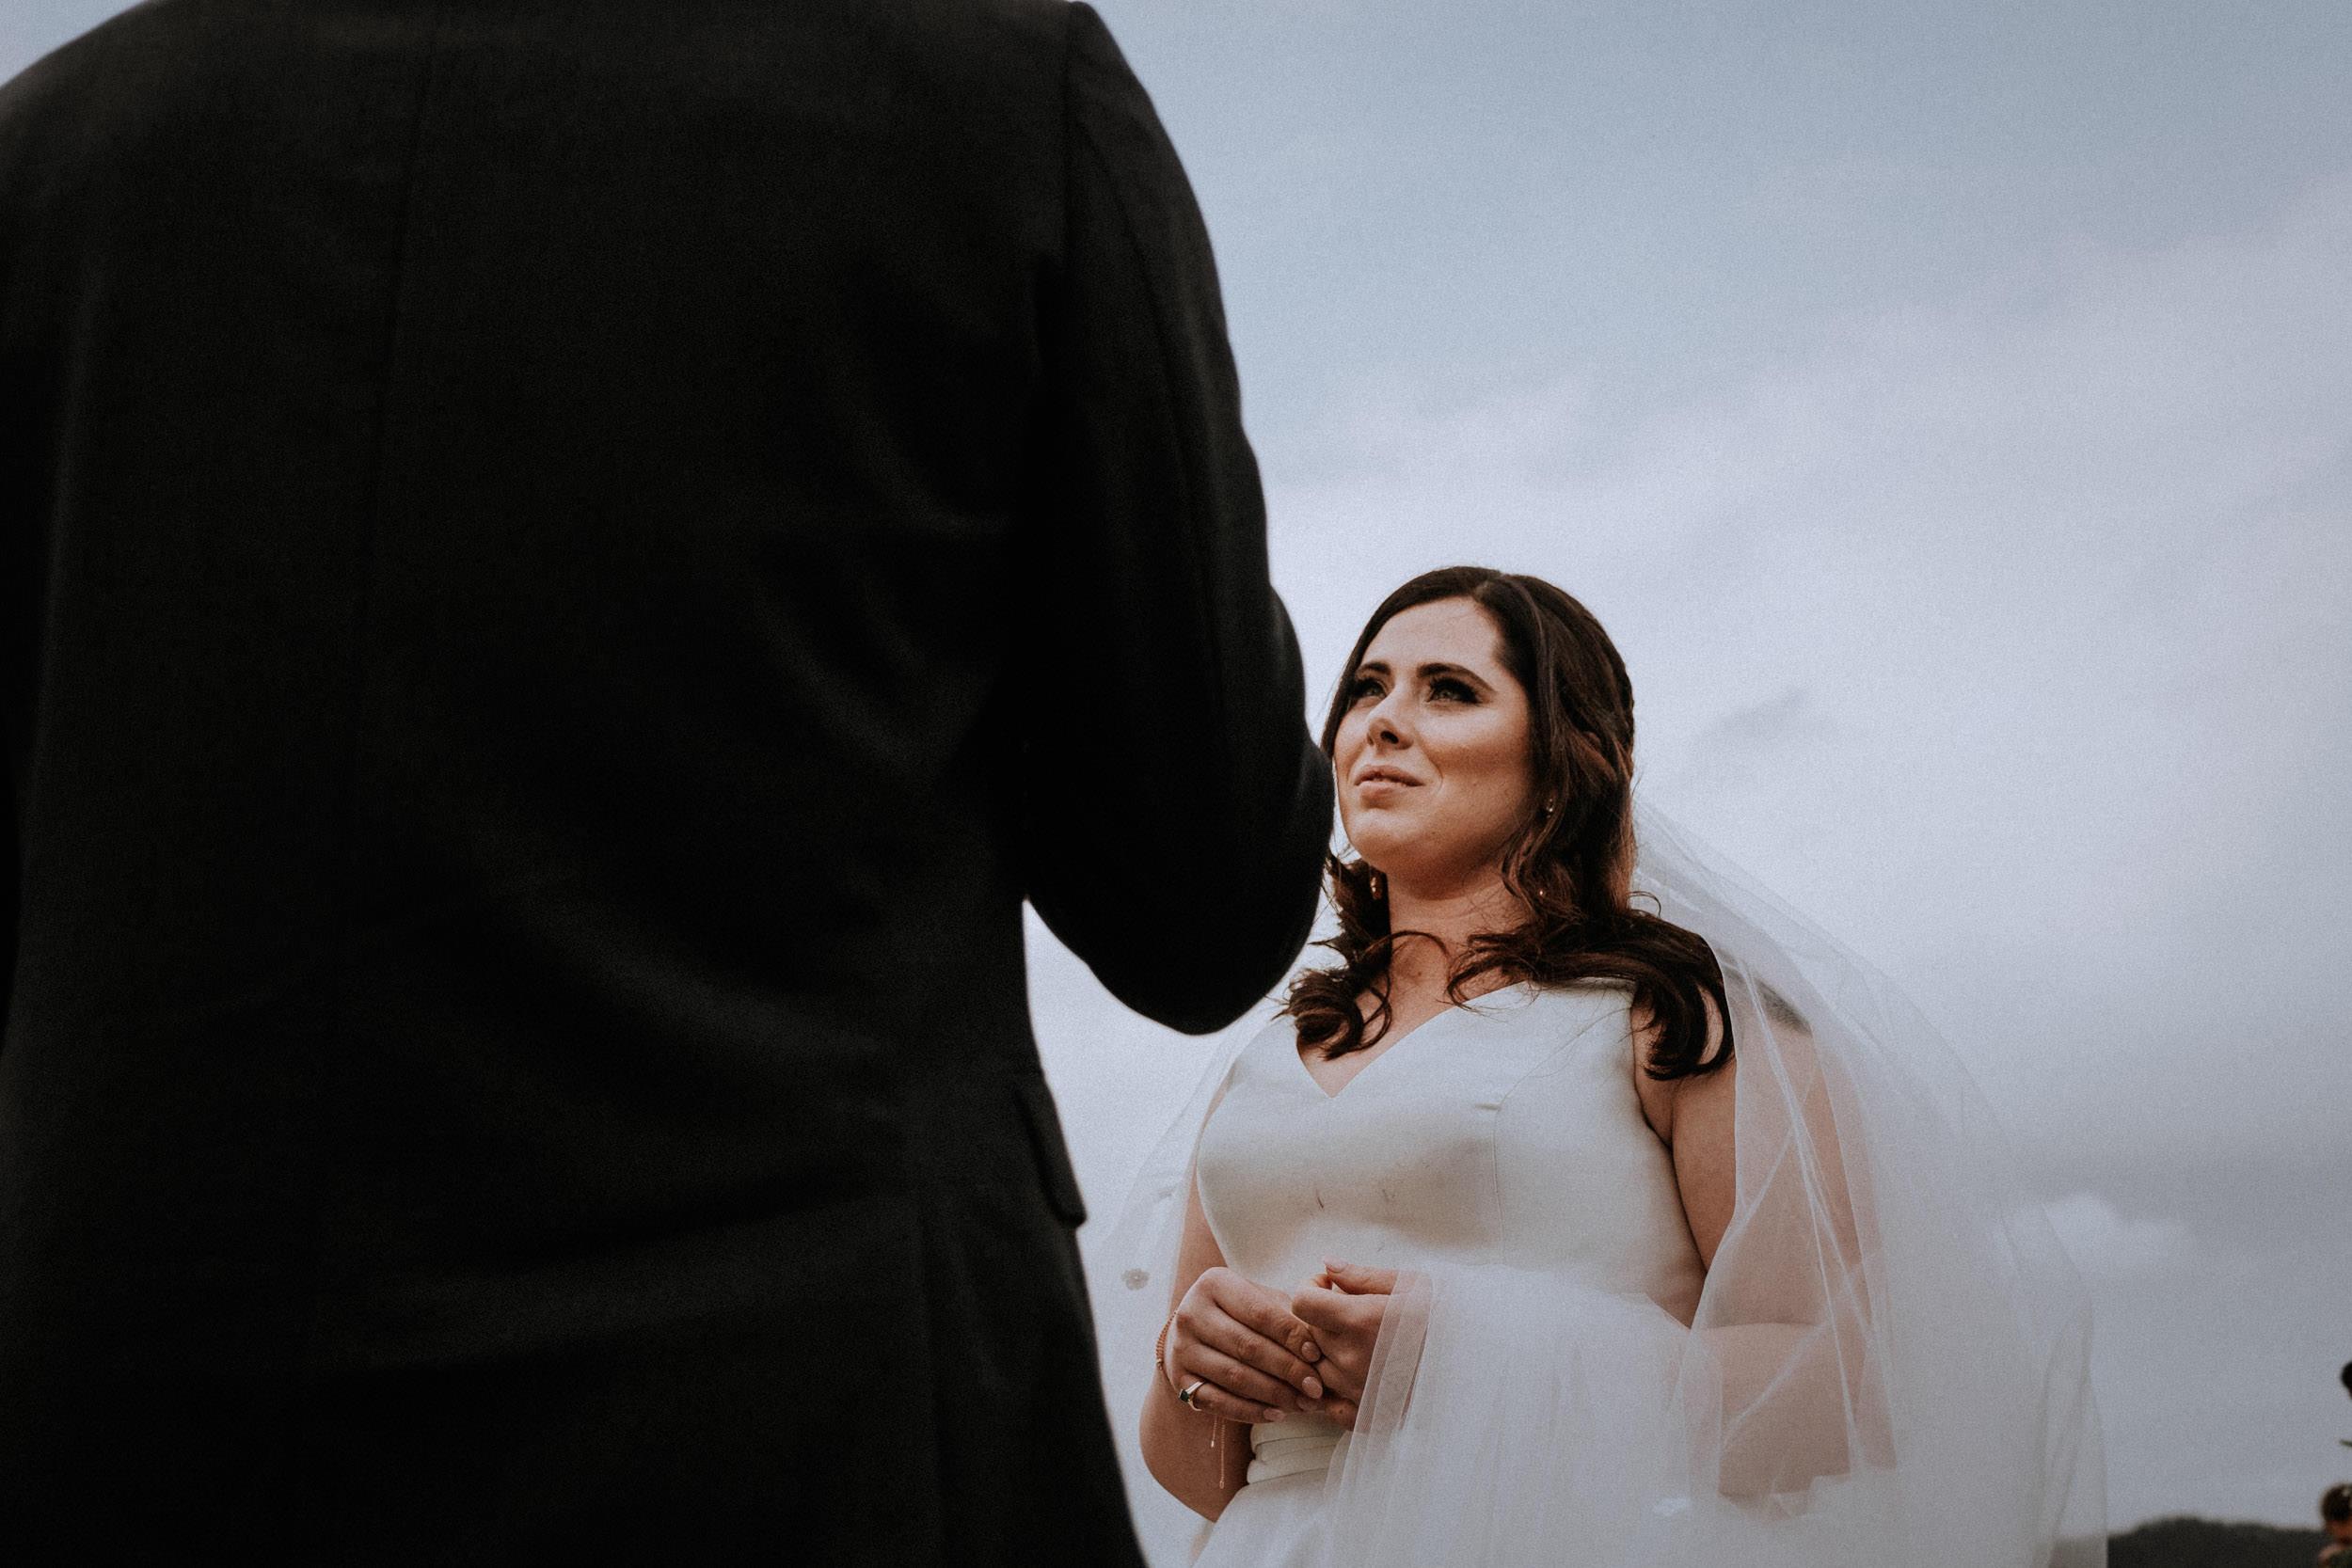 s+j_top_elopement wedding photography_kings & thieves_blog - 273.jpg